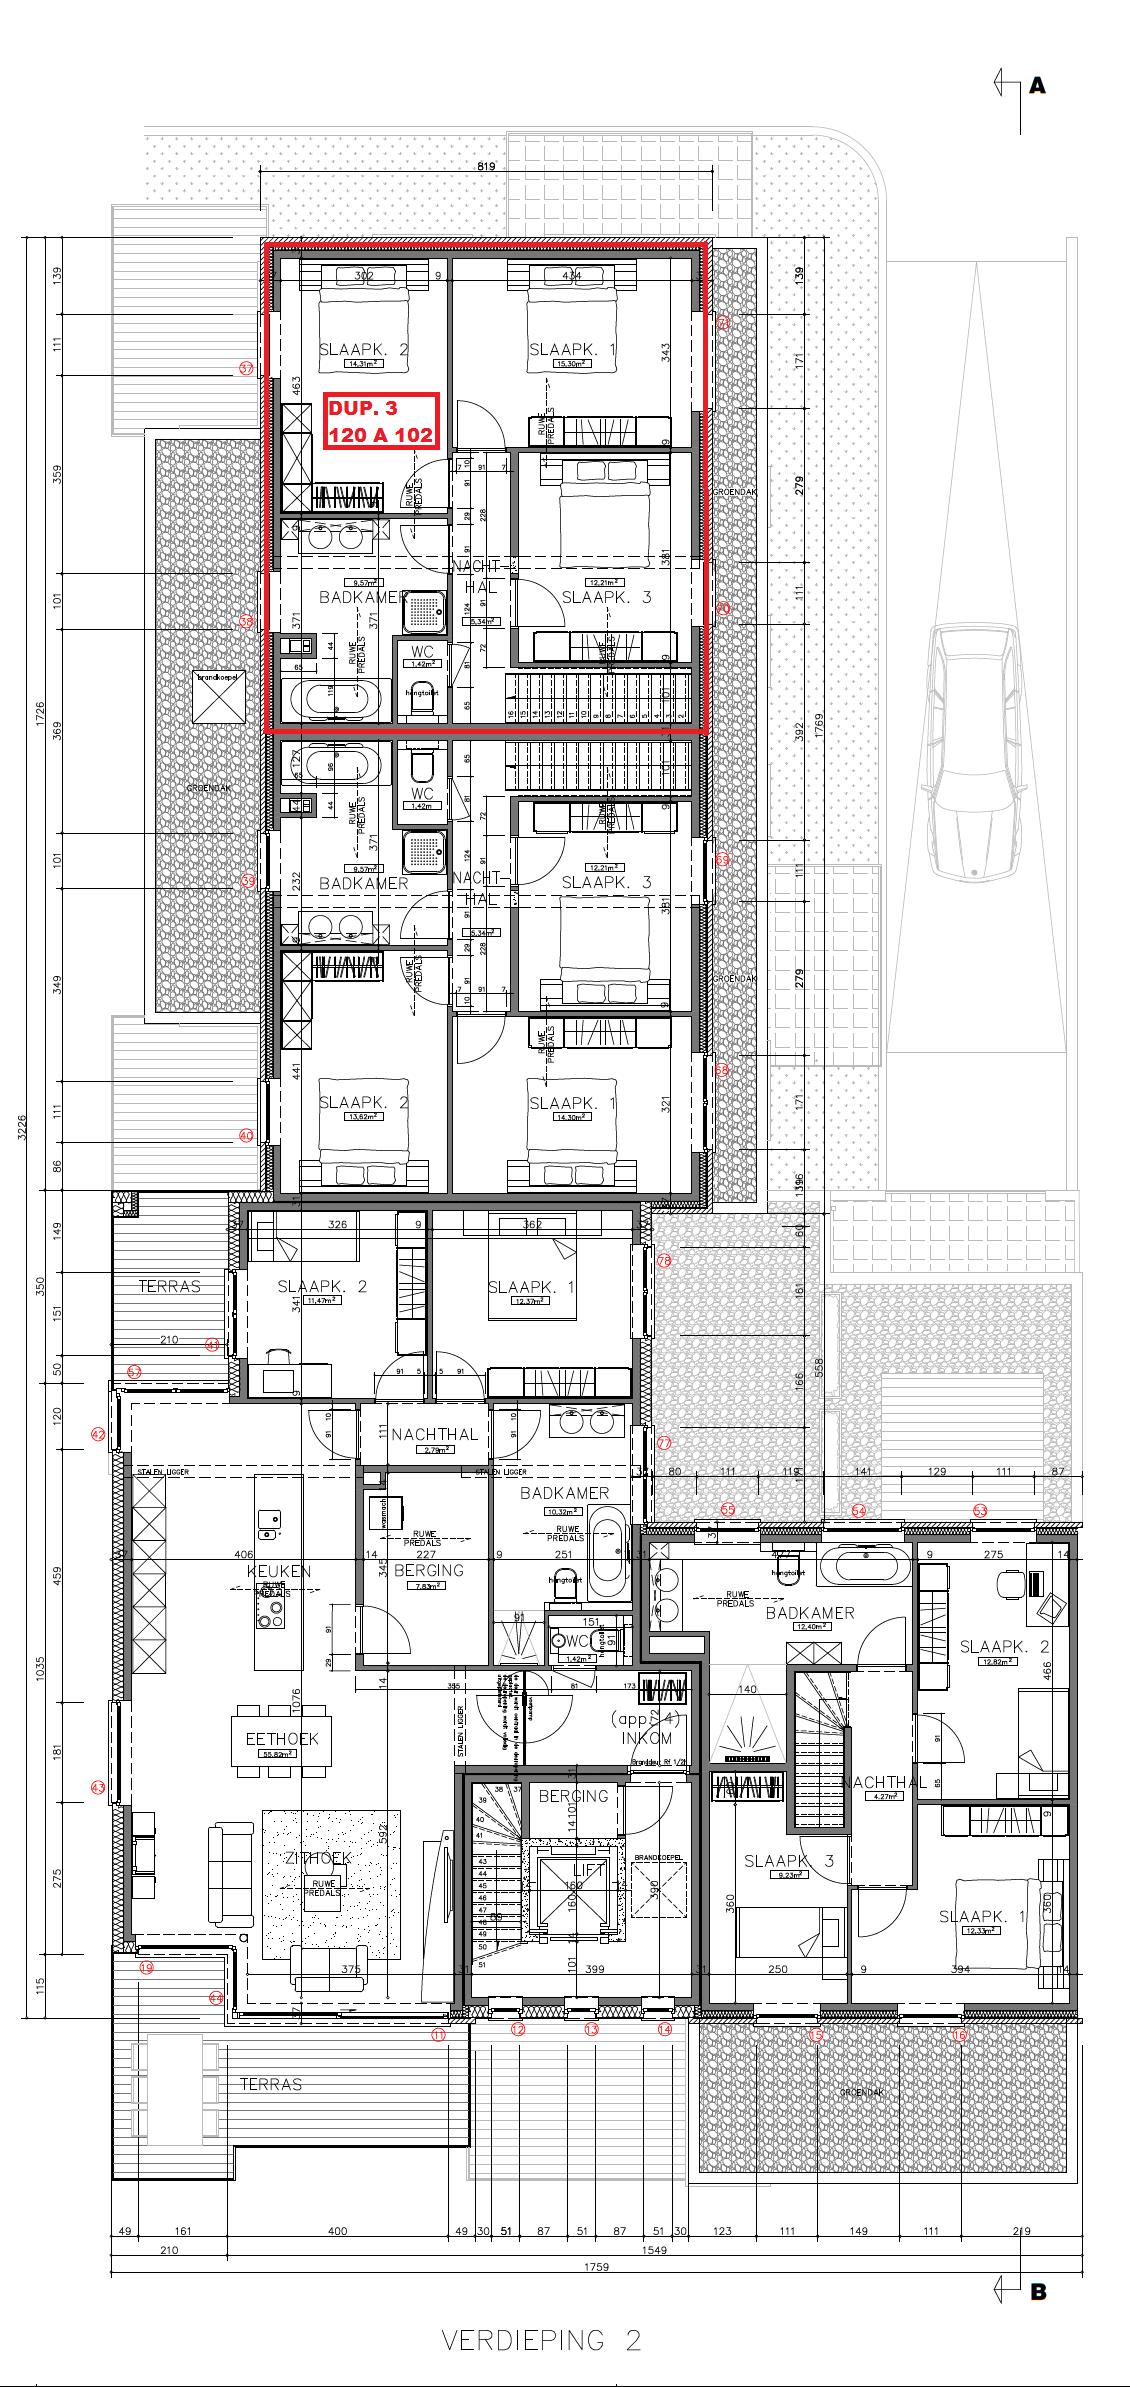 Duplex 3 120 A 102 Grondplan 2e verdieping.png